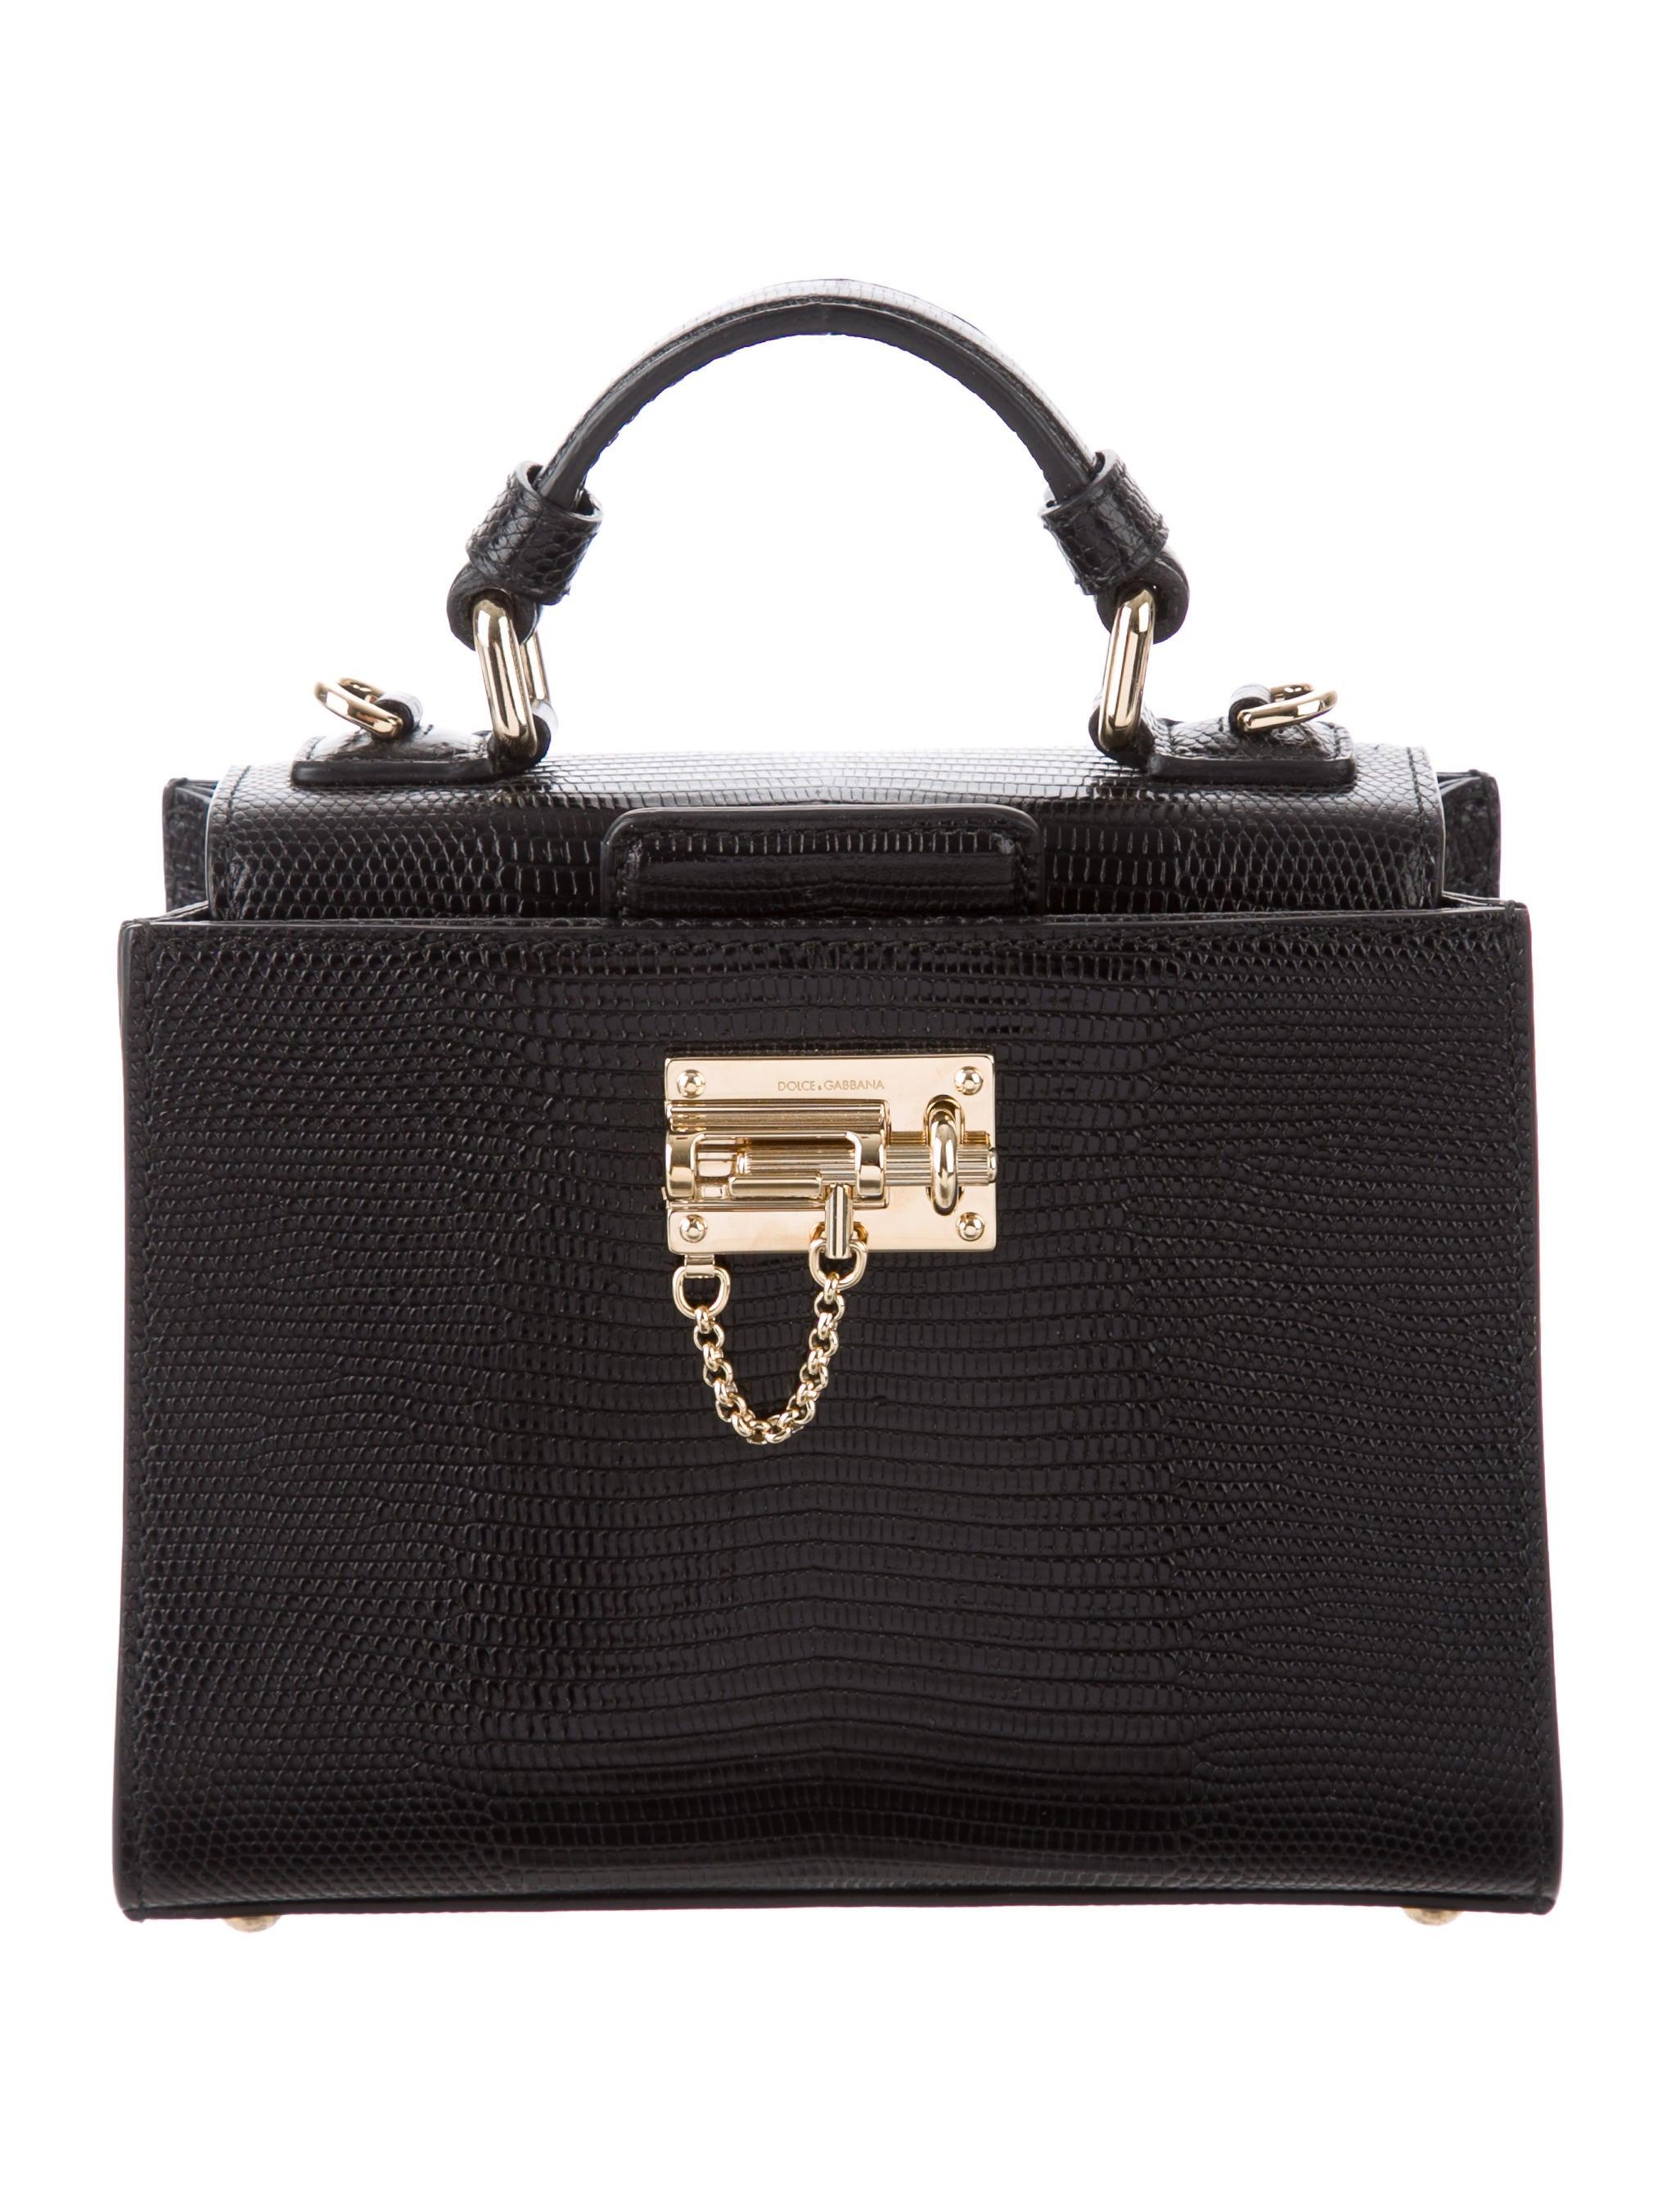 5f4377233b Dolce   Gabbana Embossed Monica Bag - Handbags - DAG106656